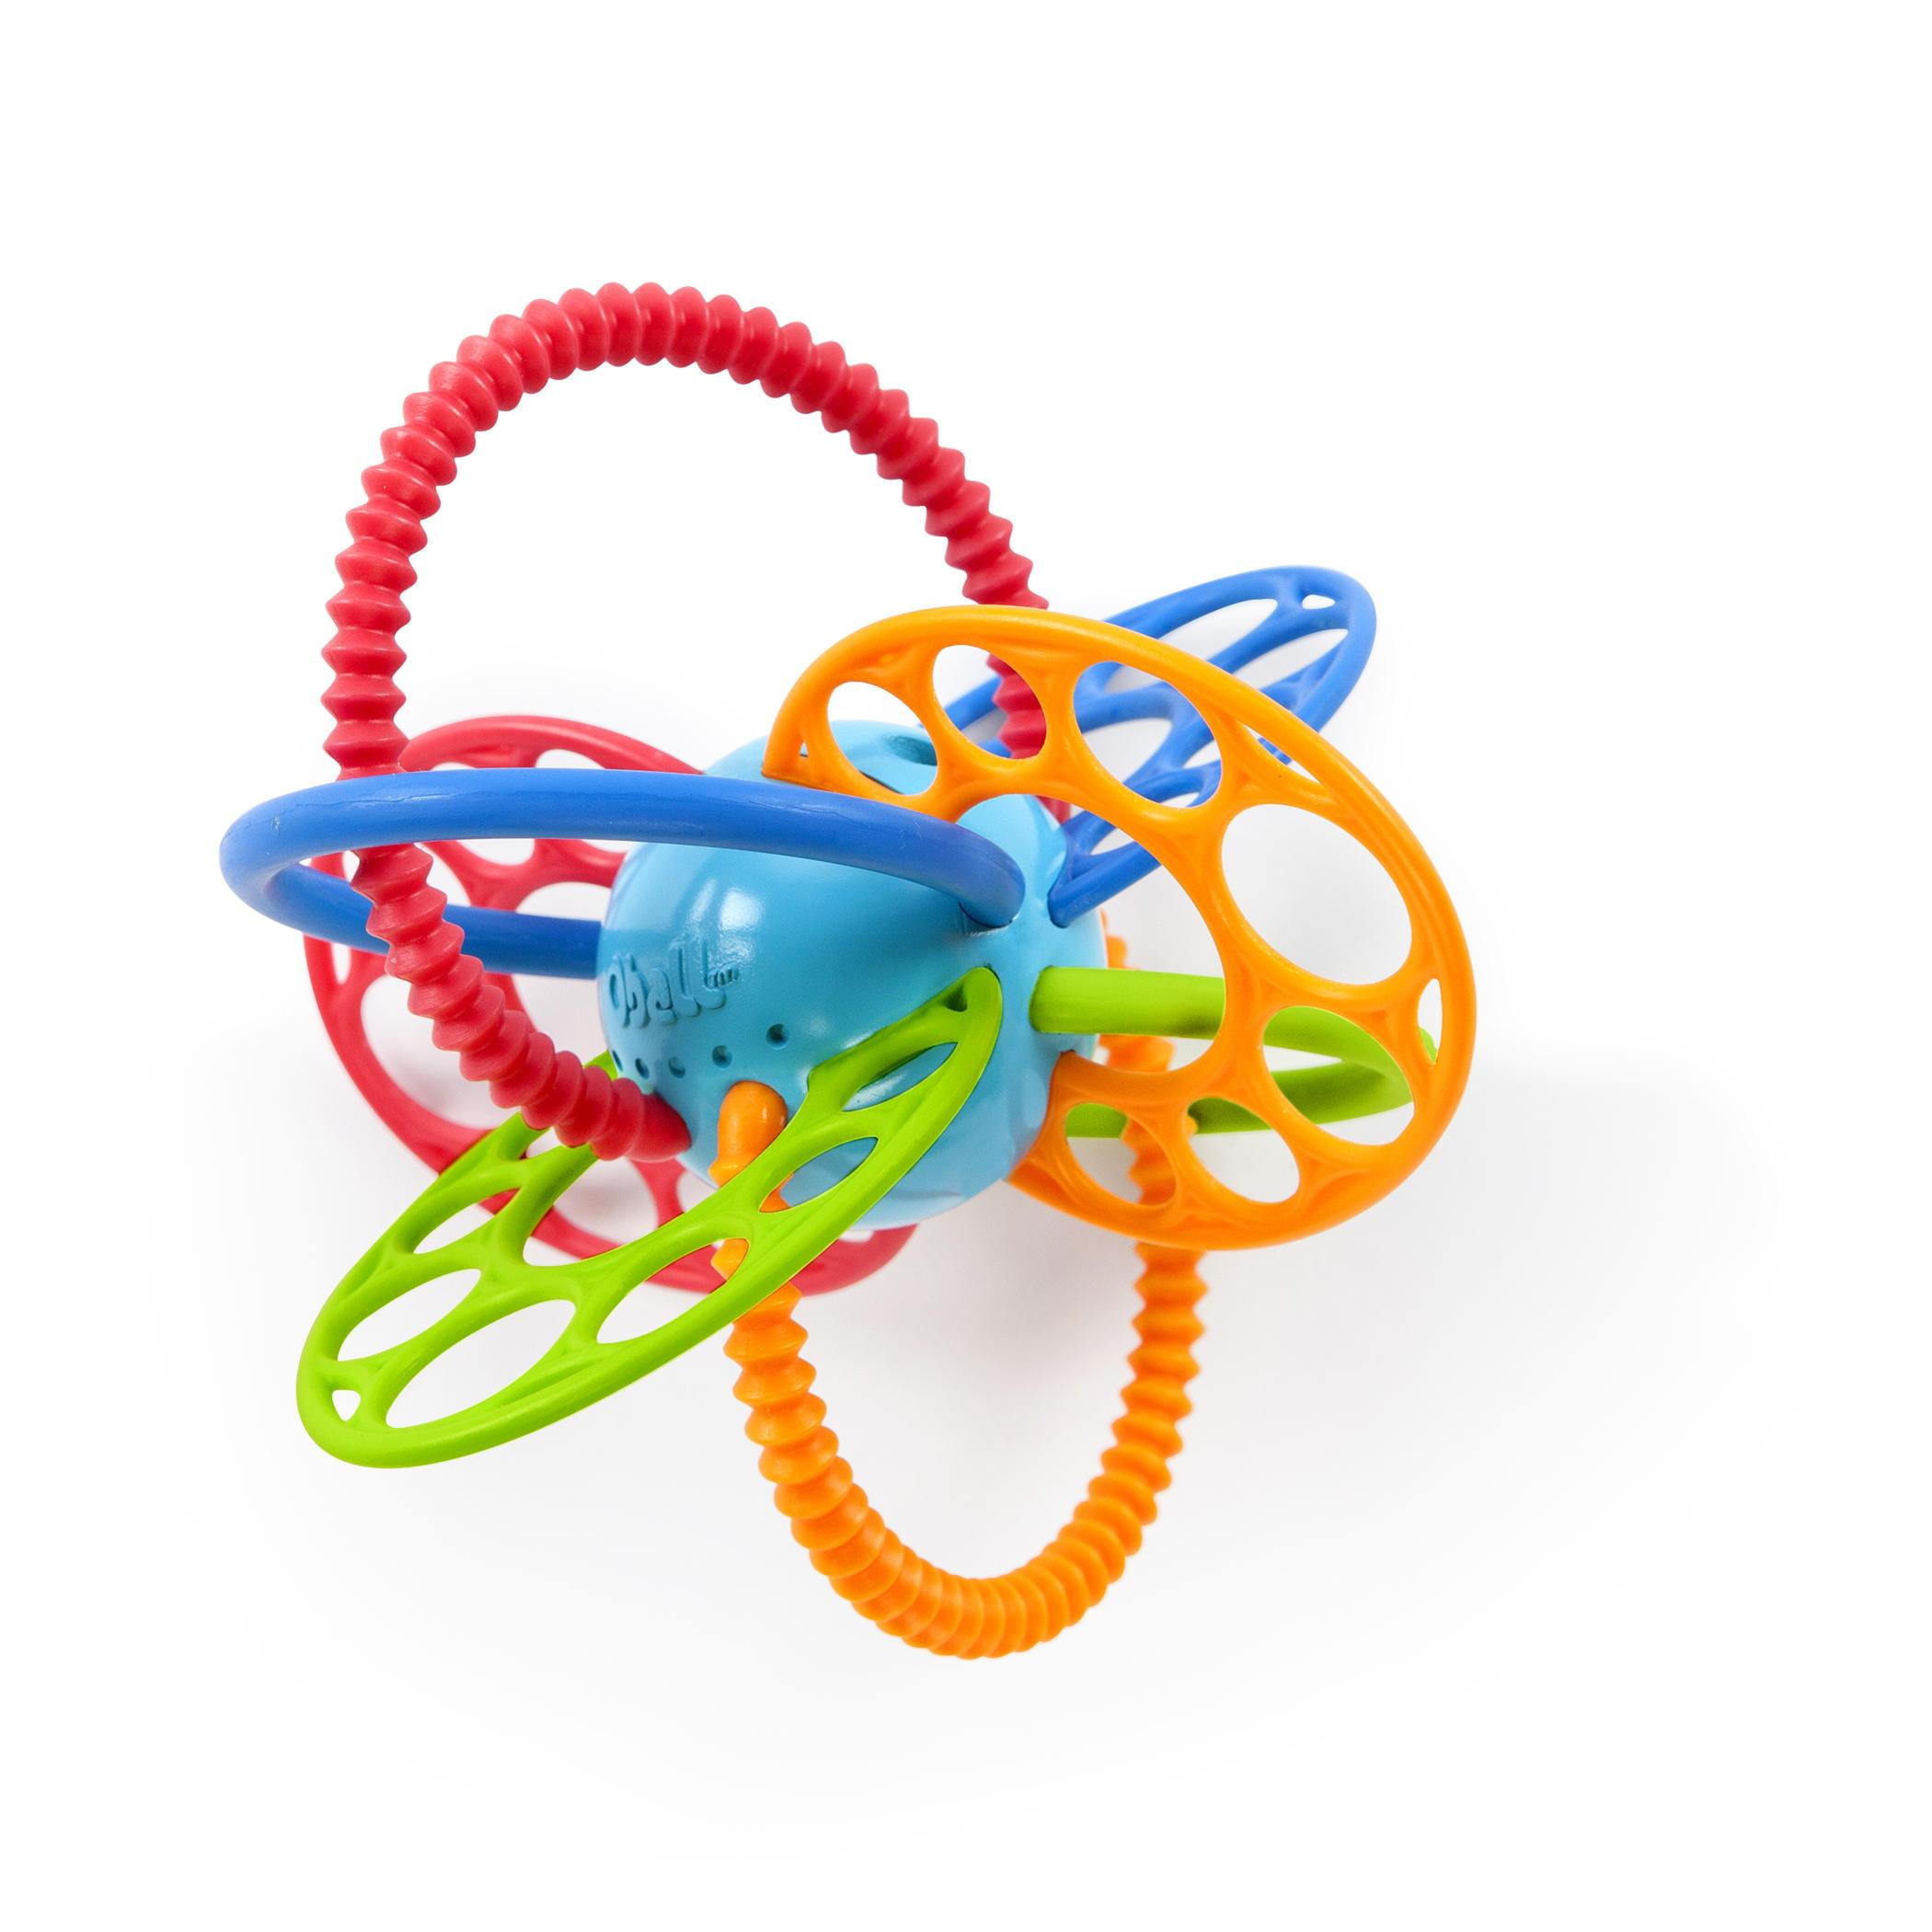 Oball Flexiloops Teething Toy